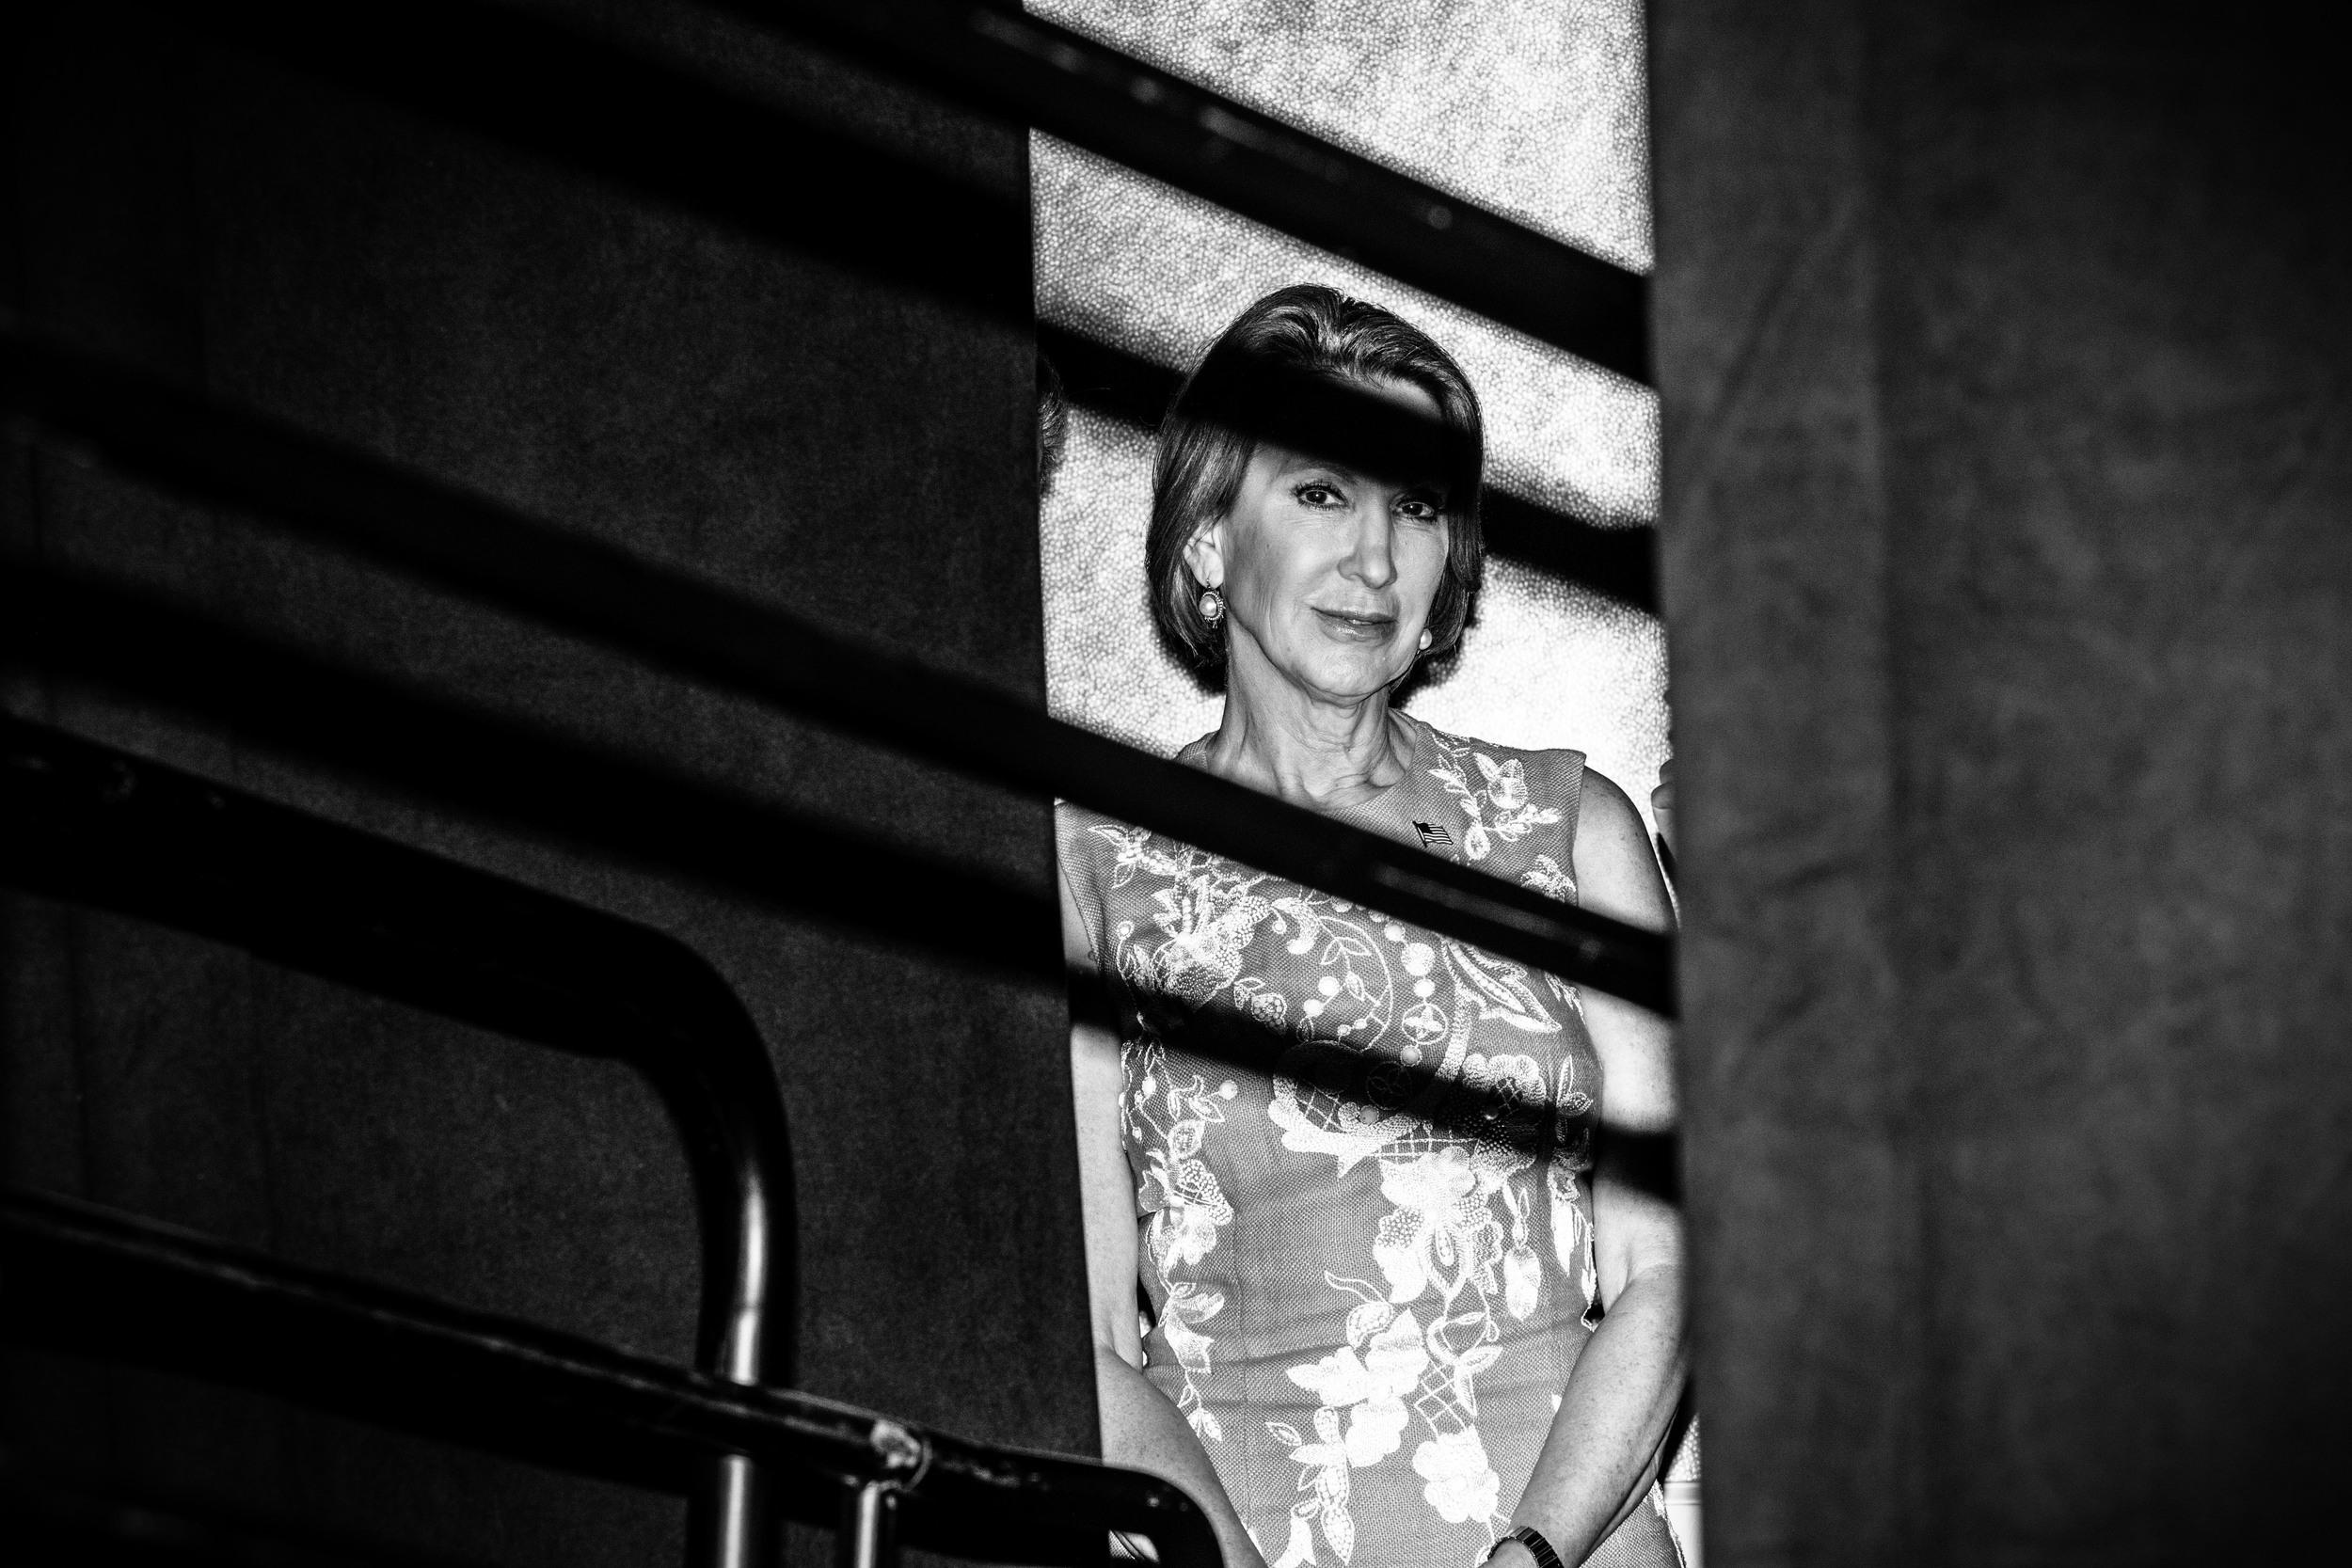 Politics in Black & White:     Carly Fiorina waits to speak in Atlanta. © Mark Peterson/   ReduxPictures